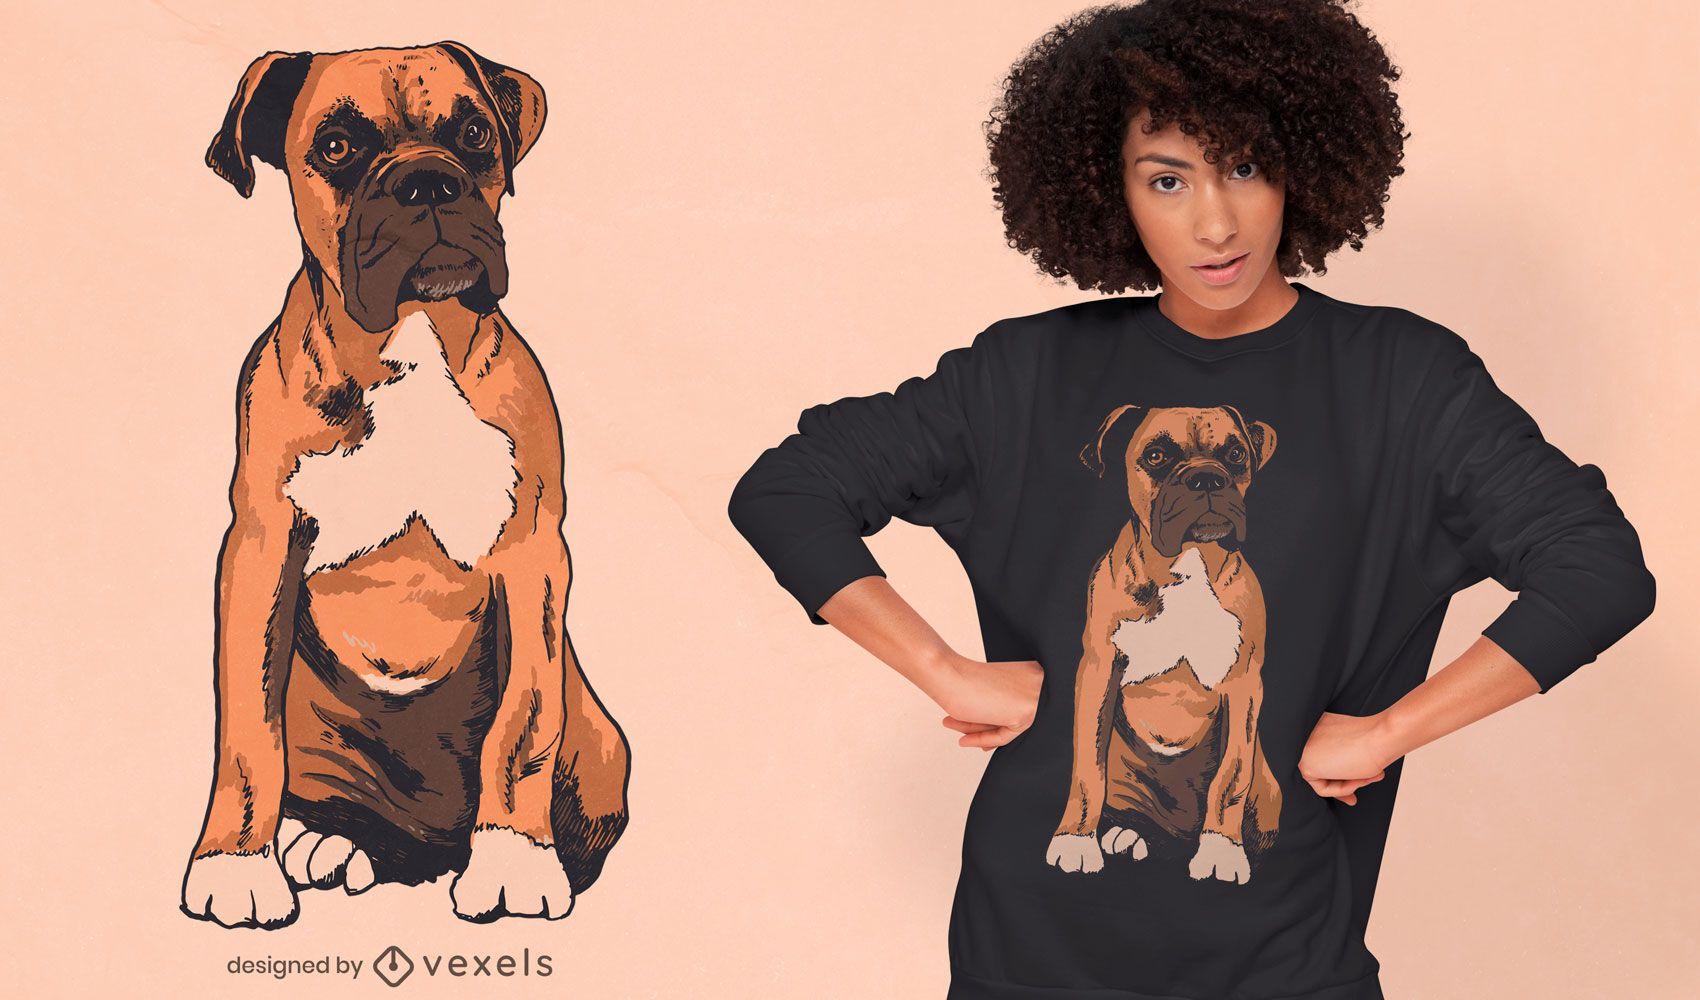 Diseño de camiseta realista de raza de perro boxer.